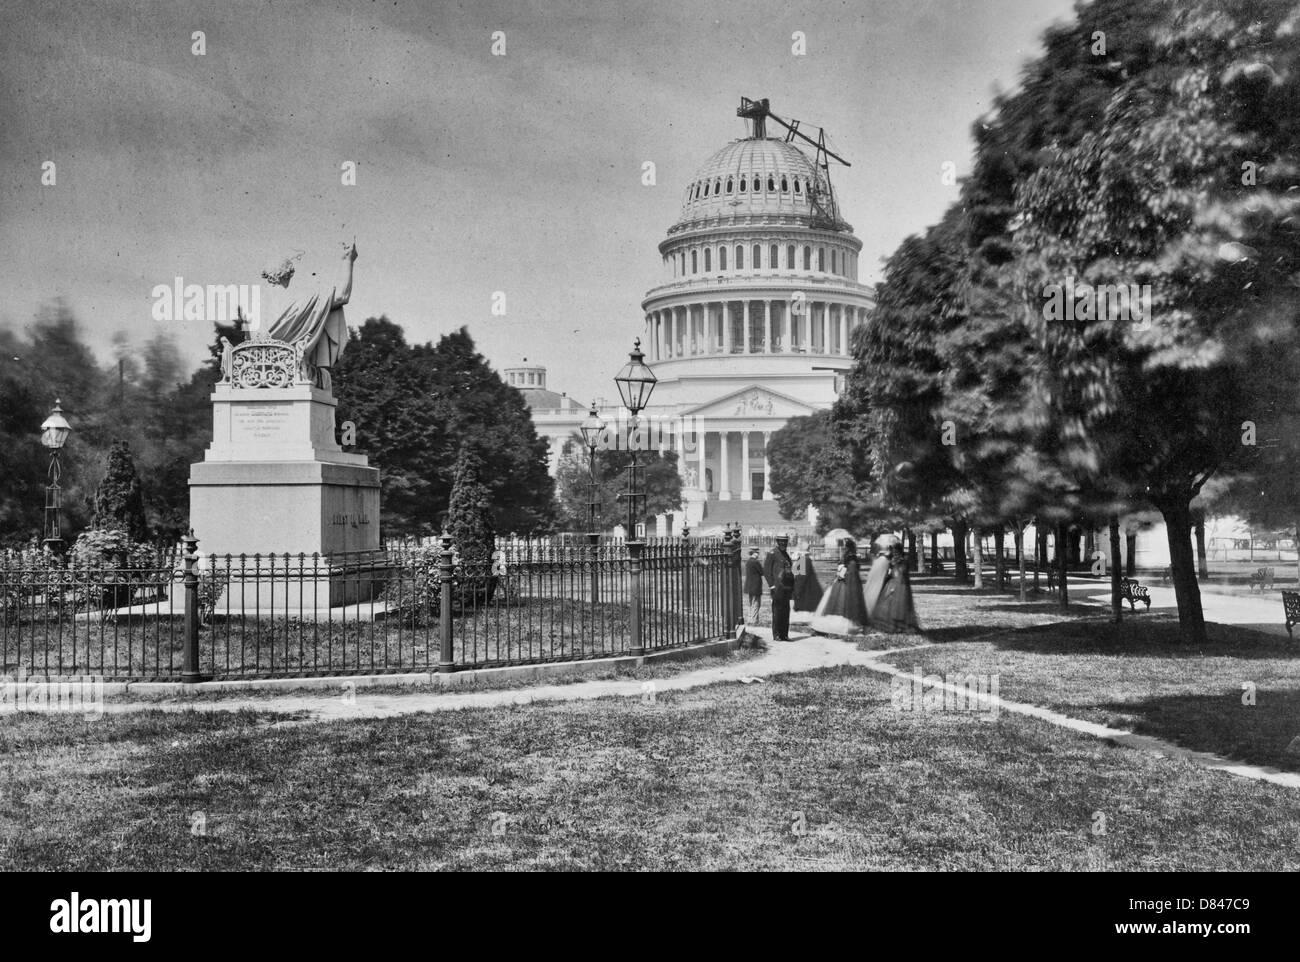 USA Capitol Building mit seiner Kuppel fast abgeschlossen, 1863 Stockbild